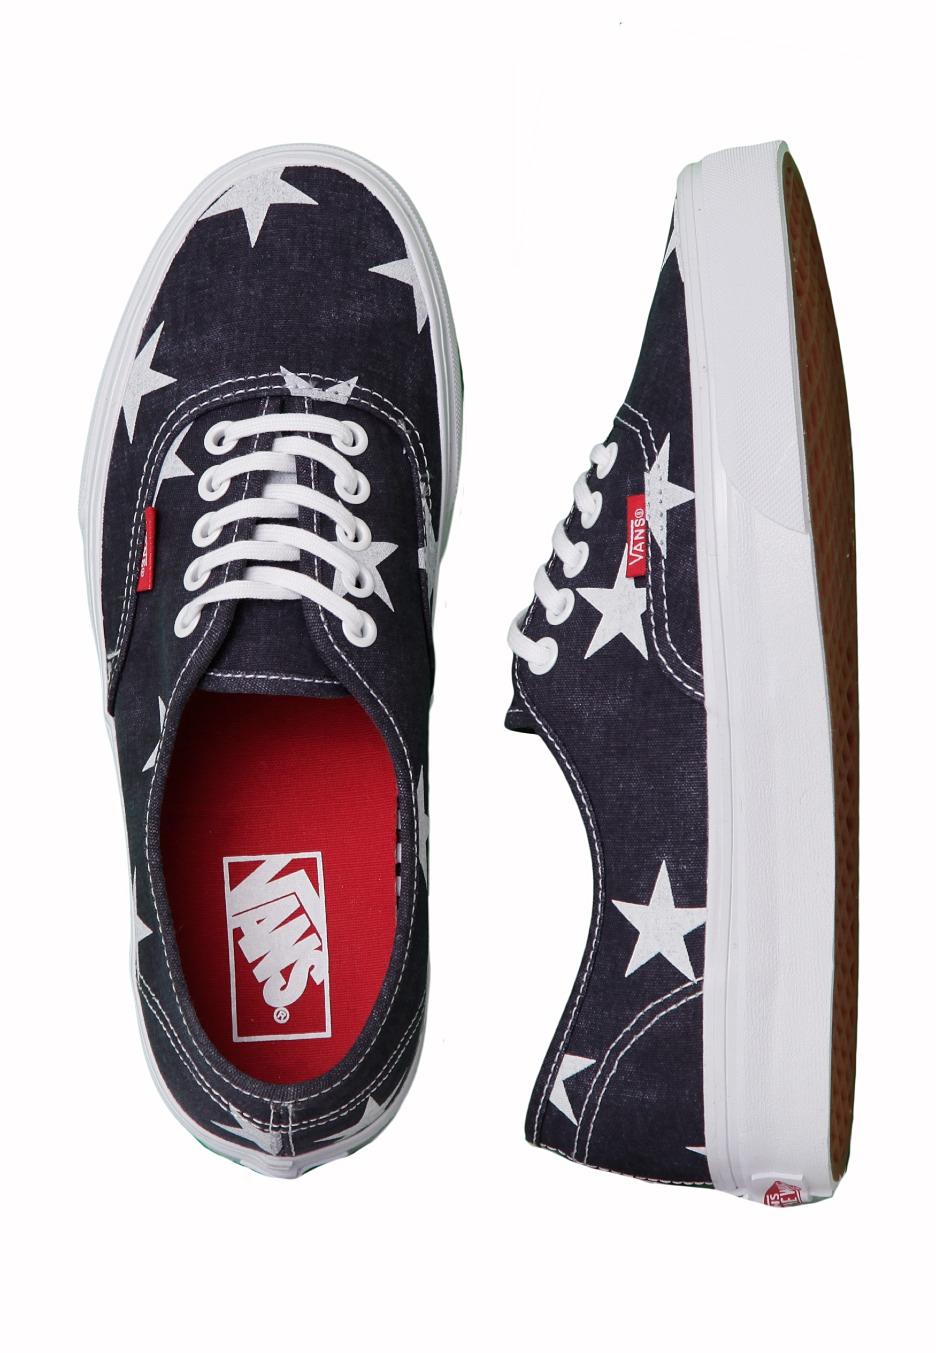 082798e310 Vans - Authentic Stars   Stripes True White - Girl Shoes - Impericon.com  Worldwide